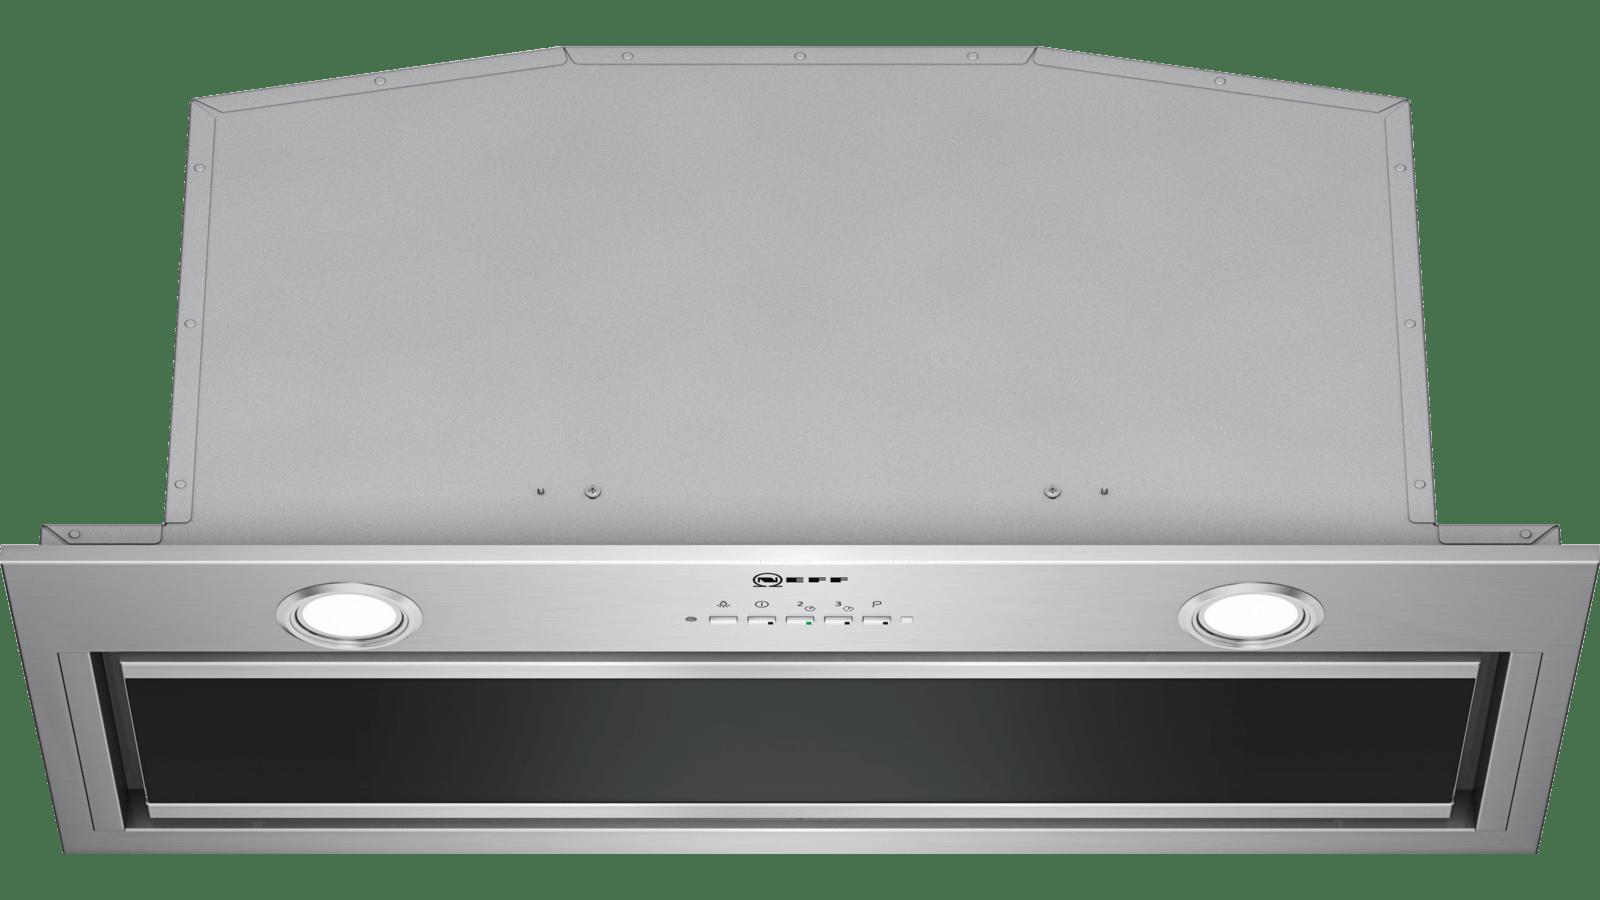 Neff N90 70cm Stainless Steel And Black Glass Canopy Hood D57ML67N1B